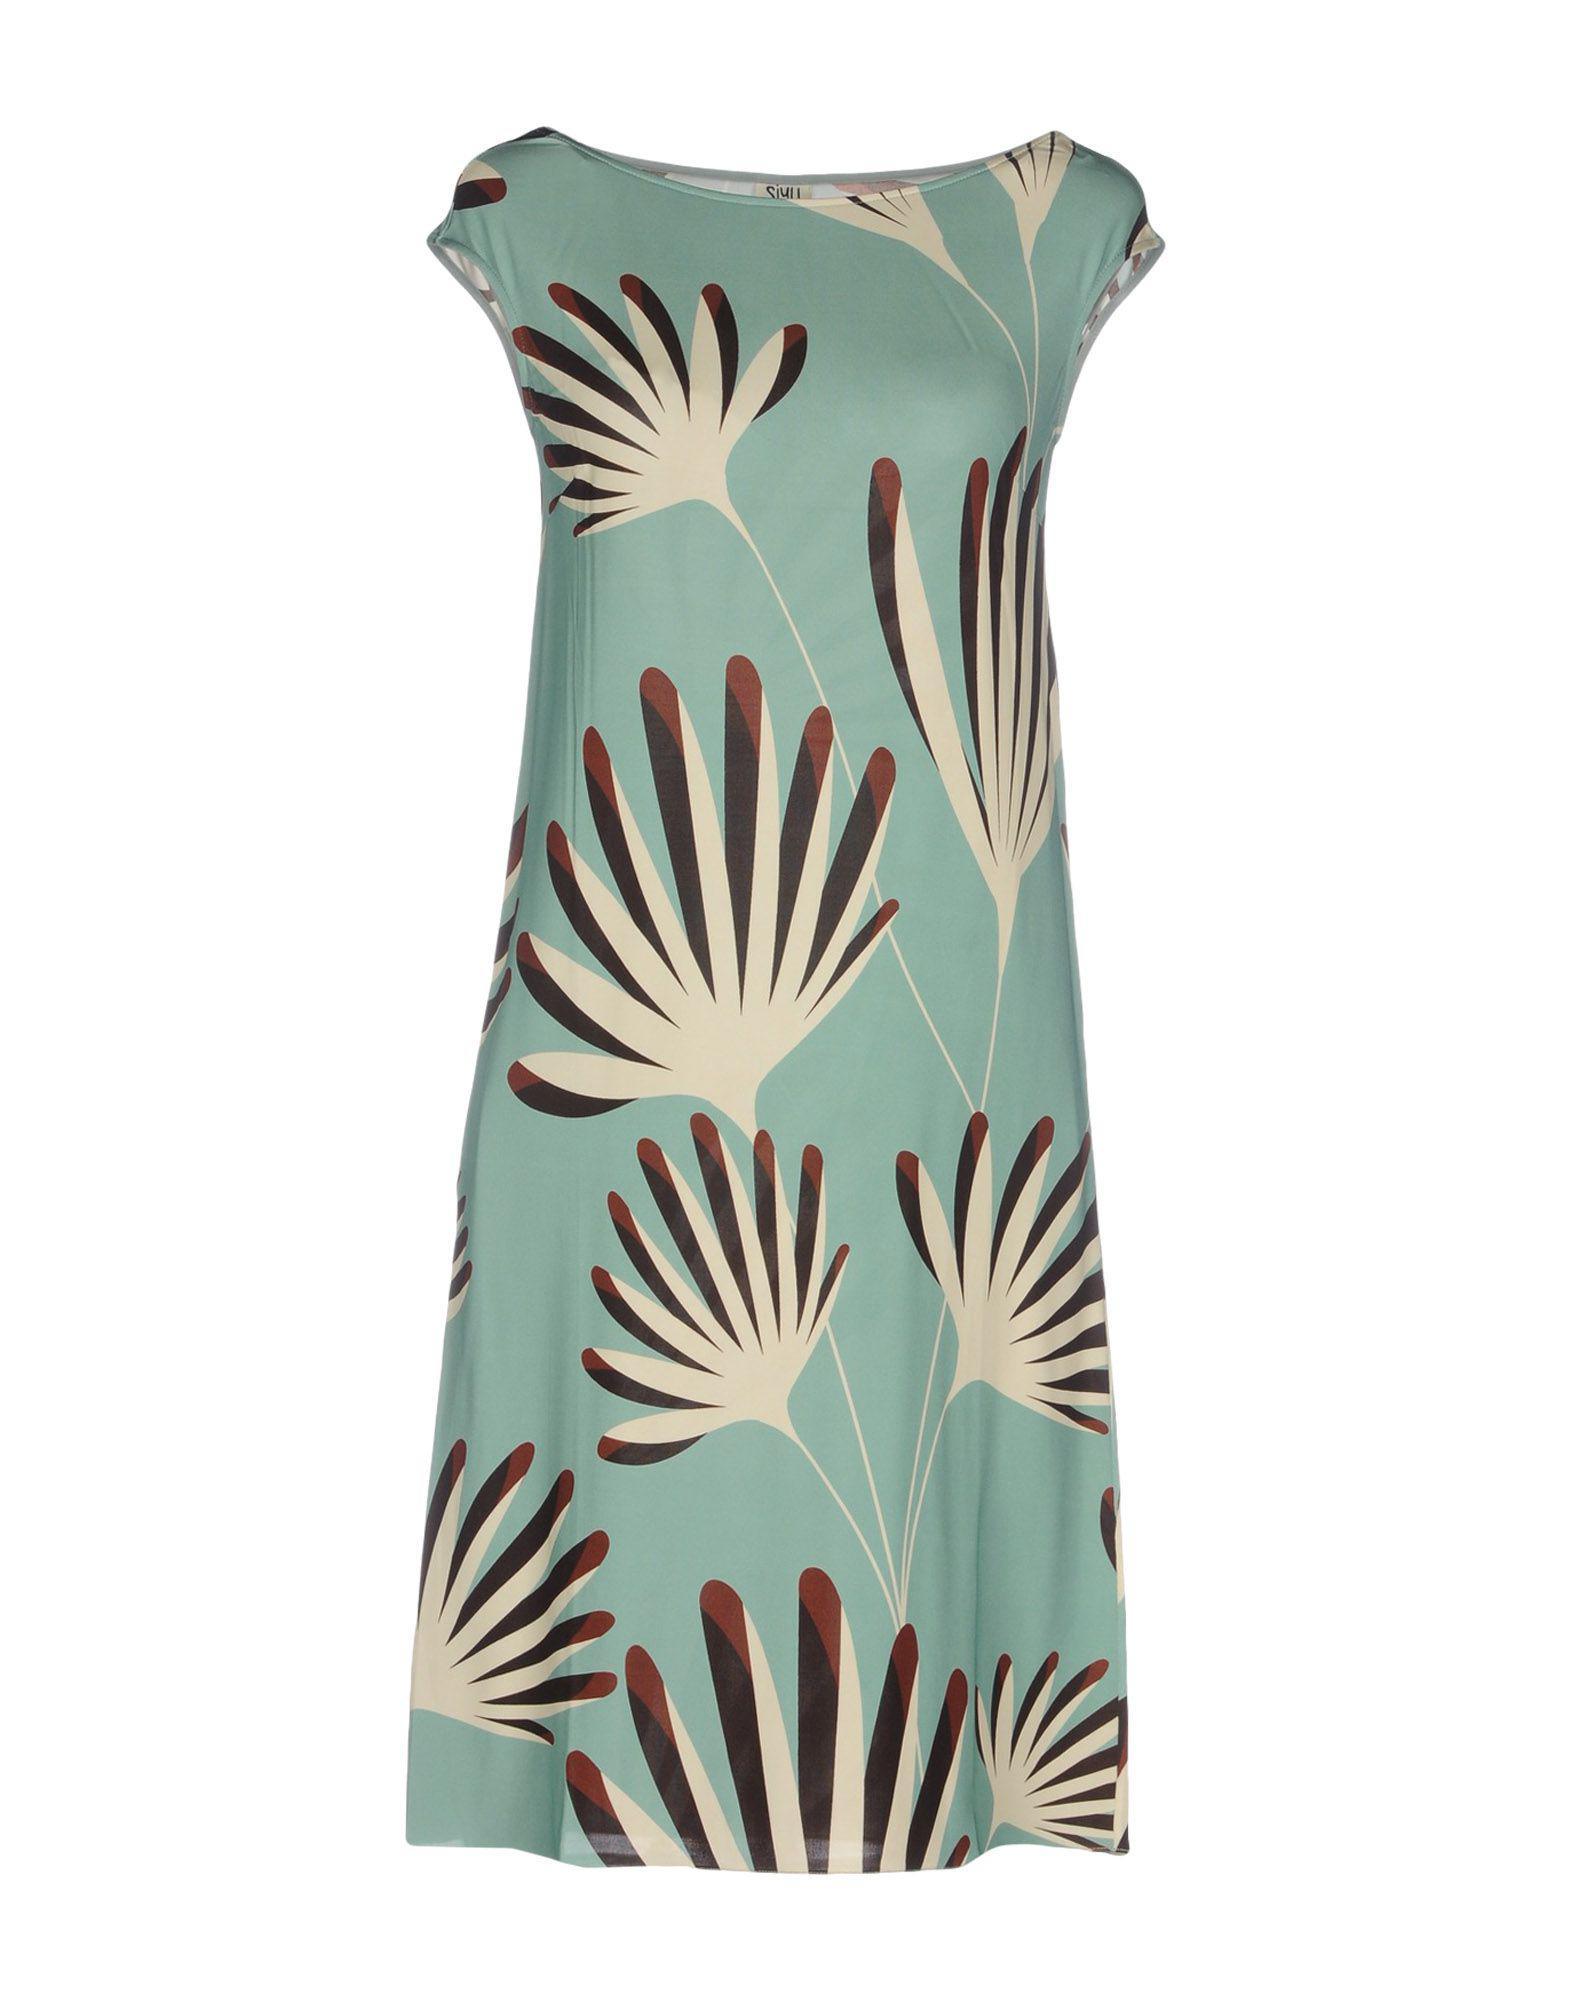 DRESSES - Short dresses Siyu h5n4Ydpn8